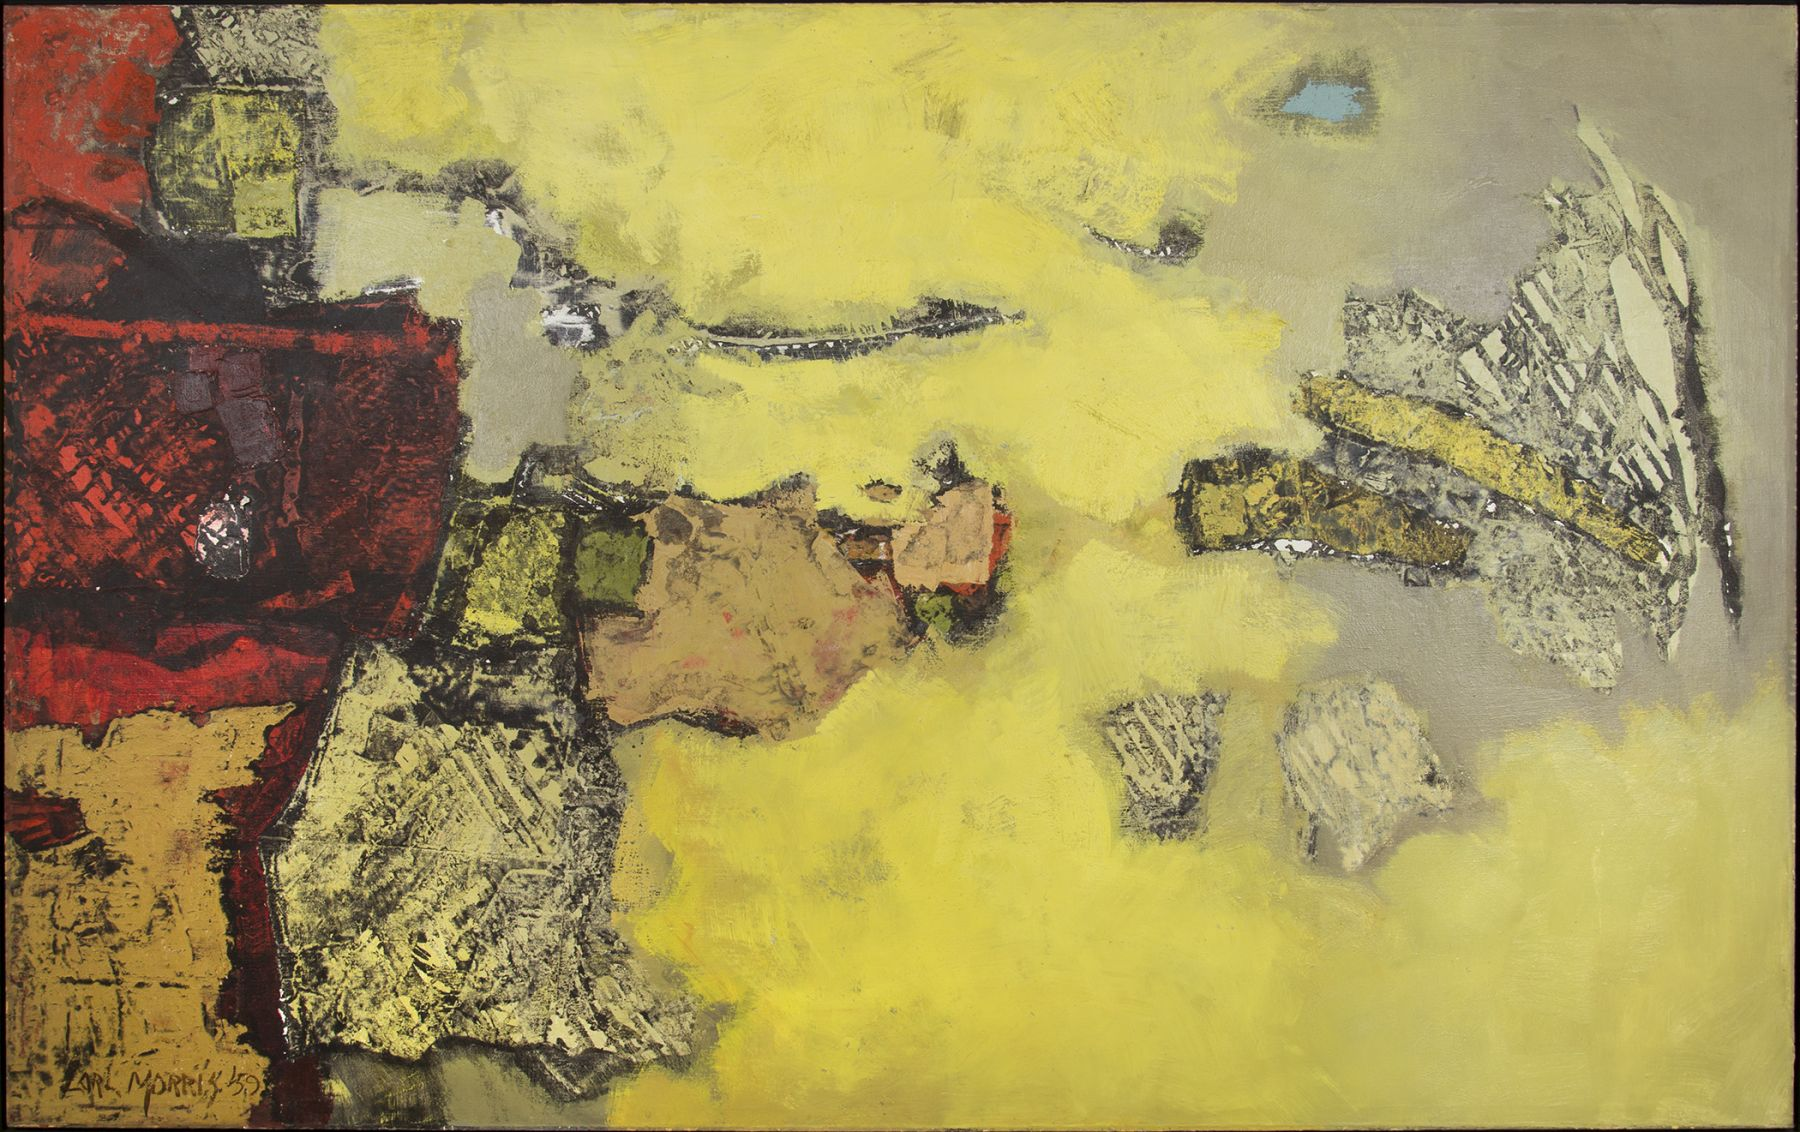 Carl Morris - Yellow Light